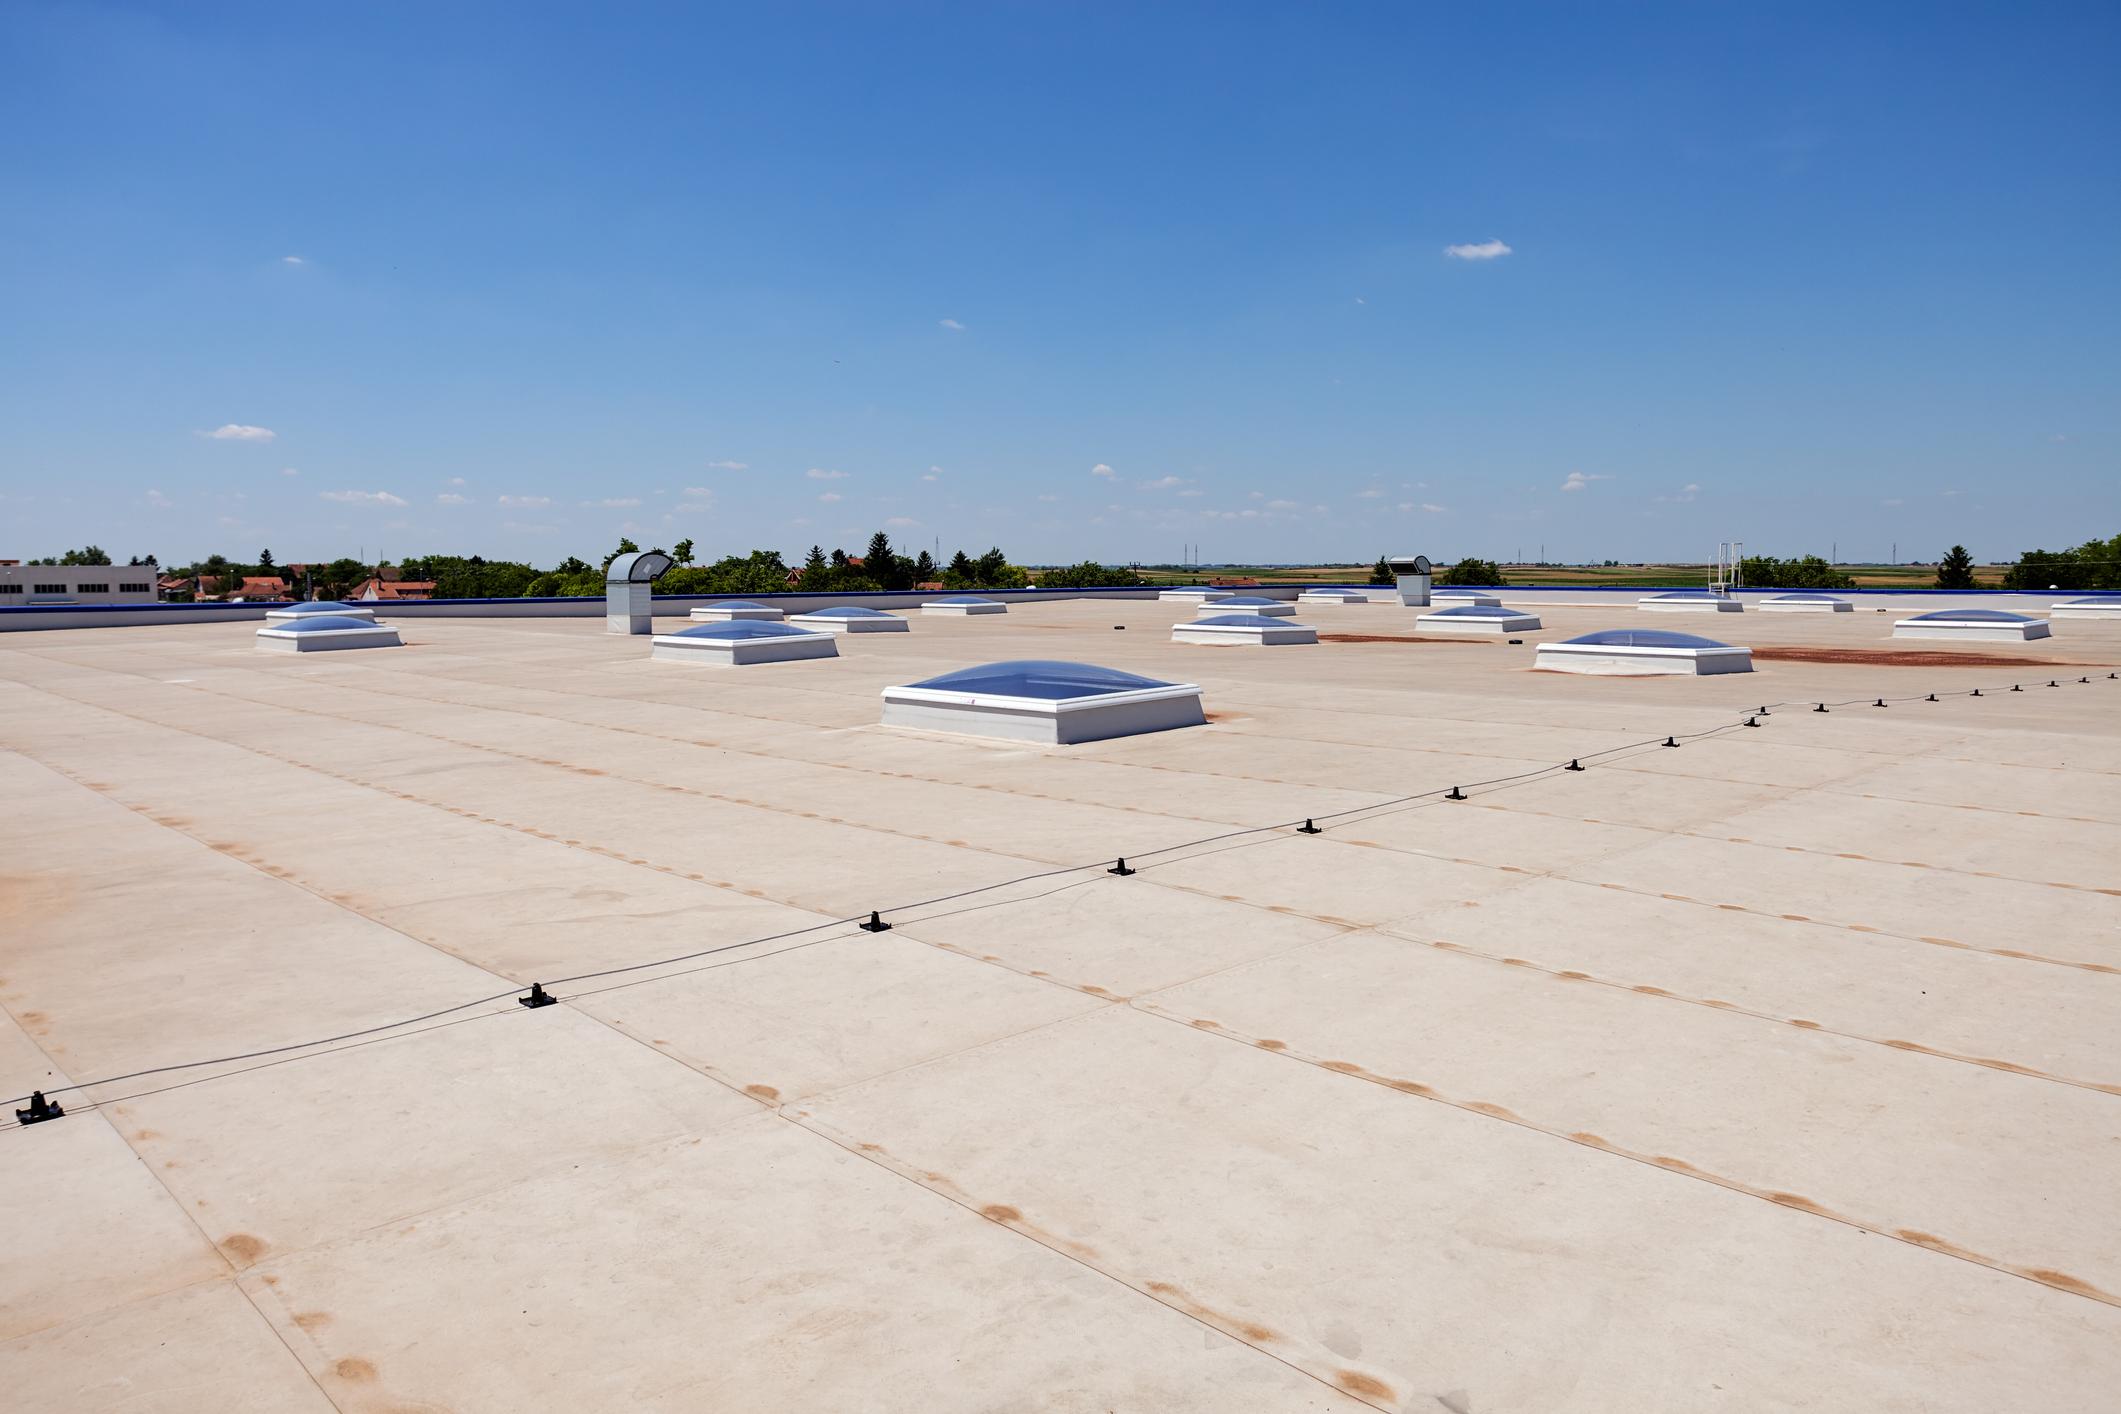 Flat Roofs -